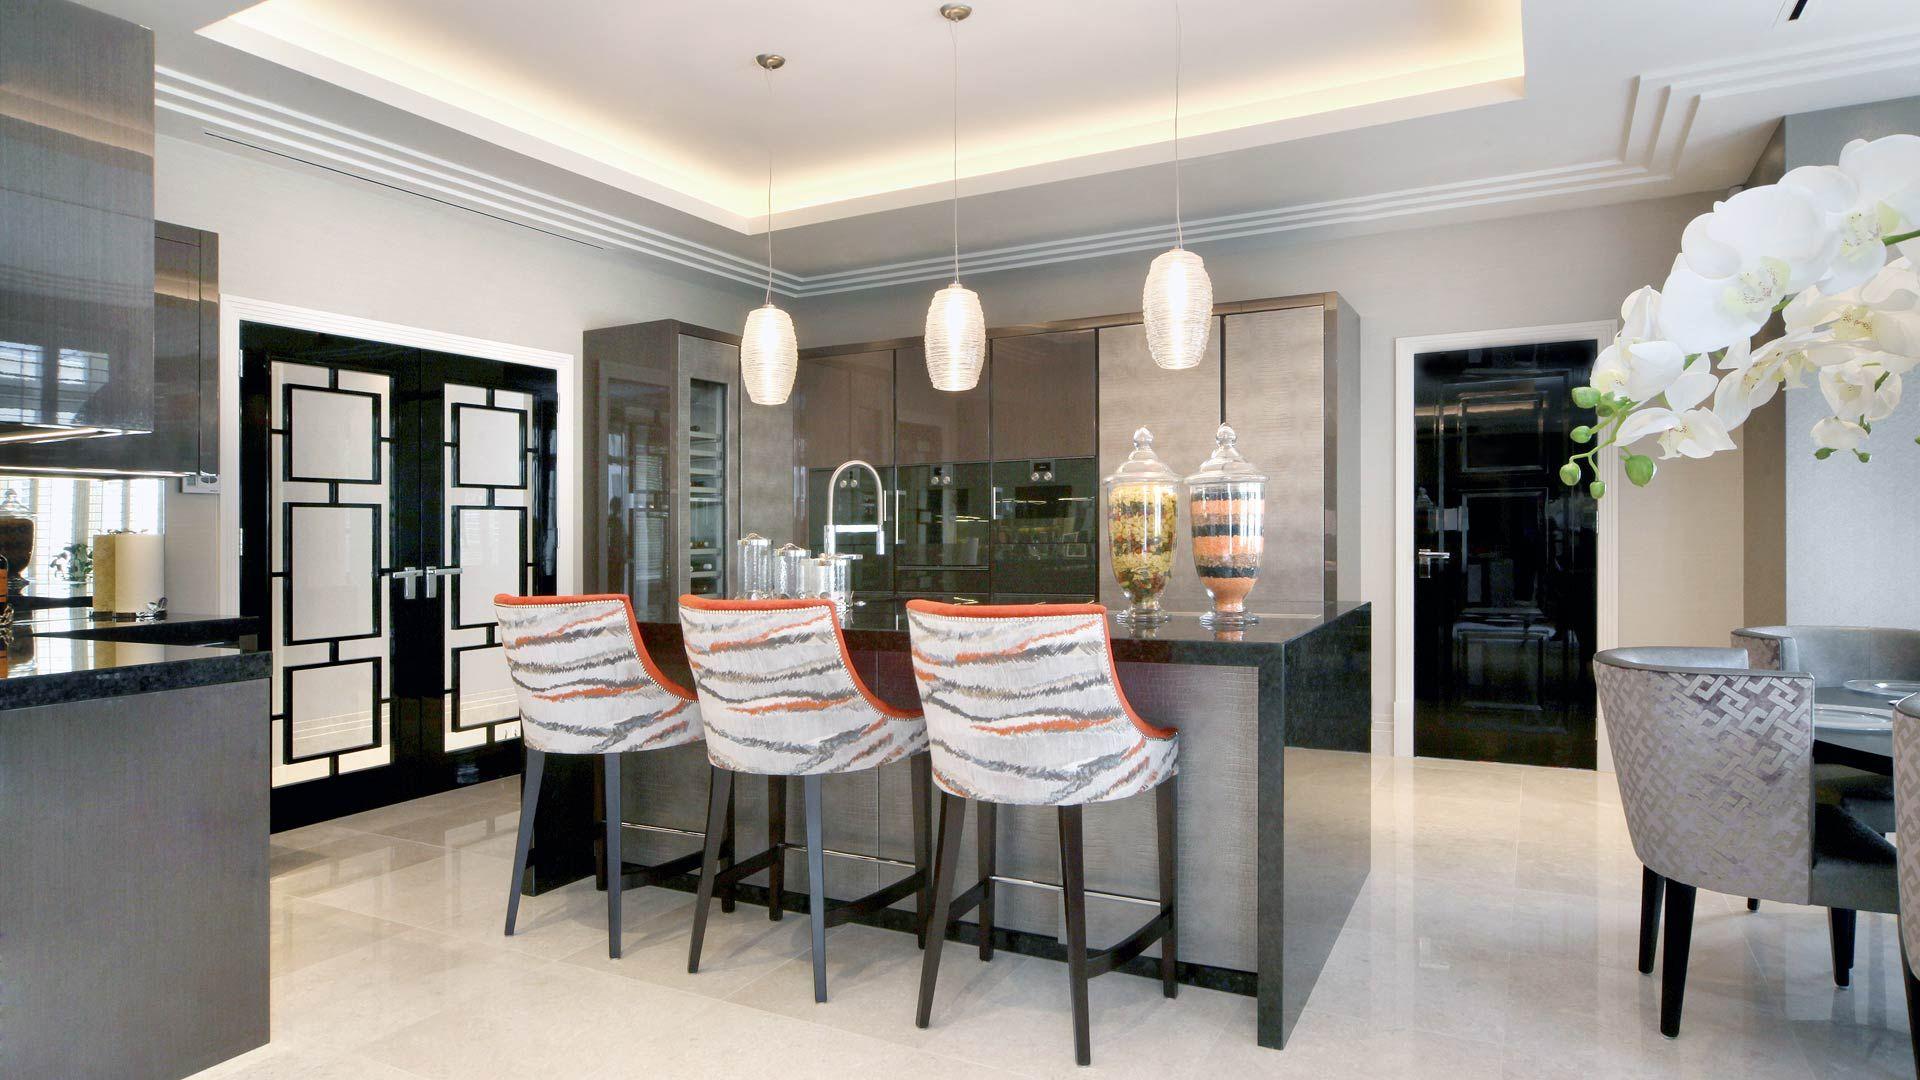 Private Estate   Essex, UK Project, Interior Design Portfolio, Hill House  Interiors Are A London Based Interior Design Company With A Showroom In  Elystan ...